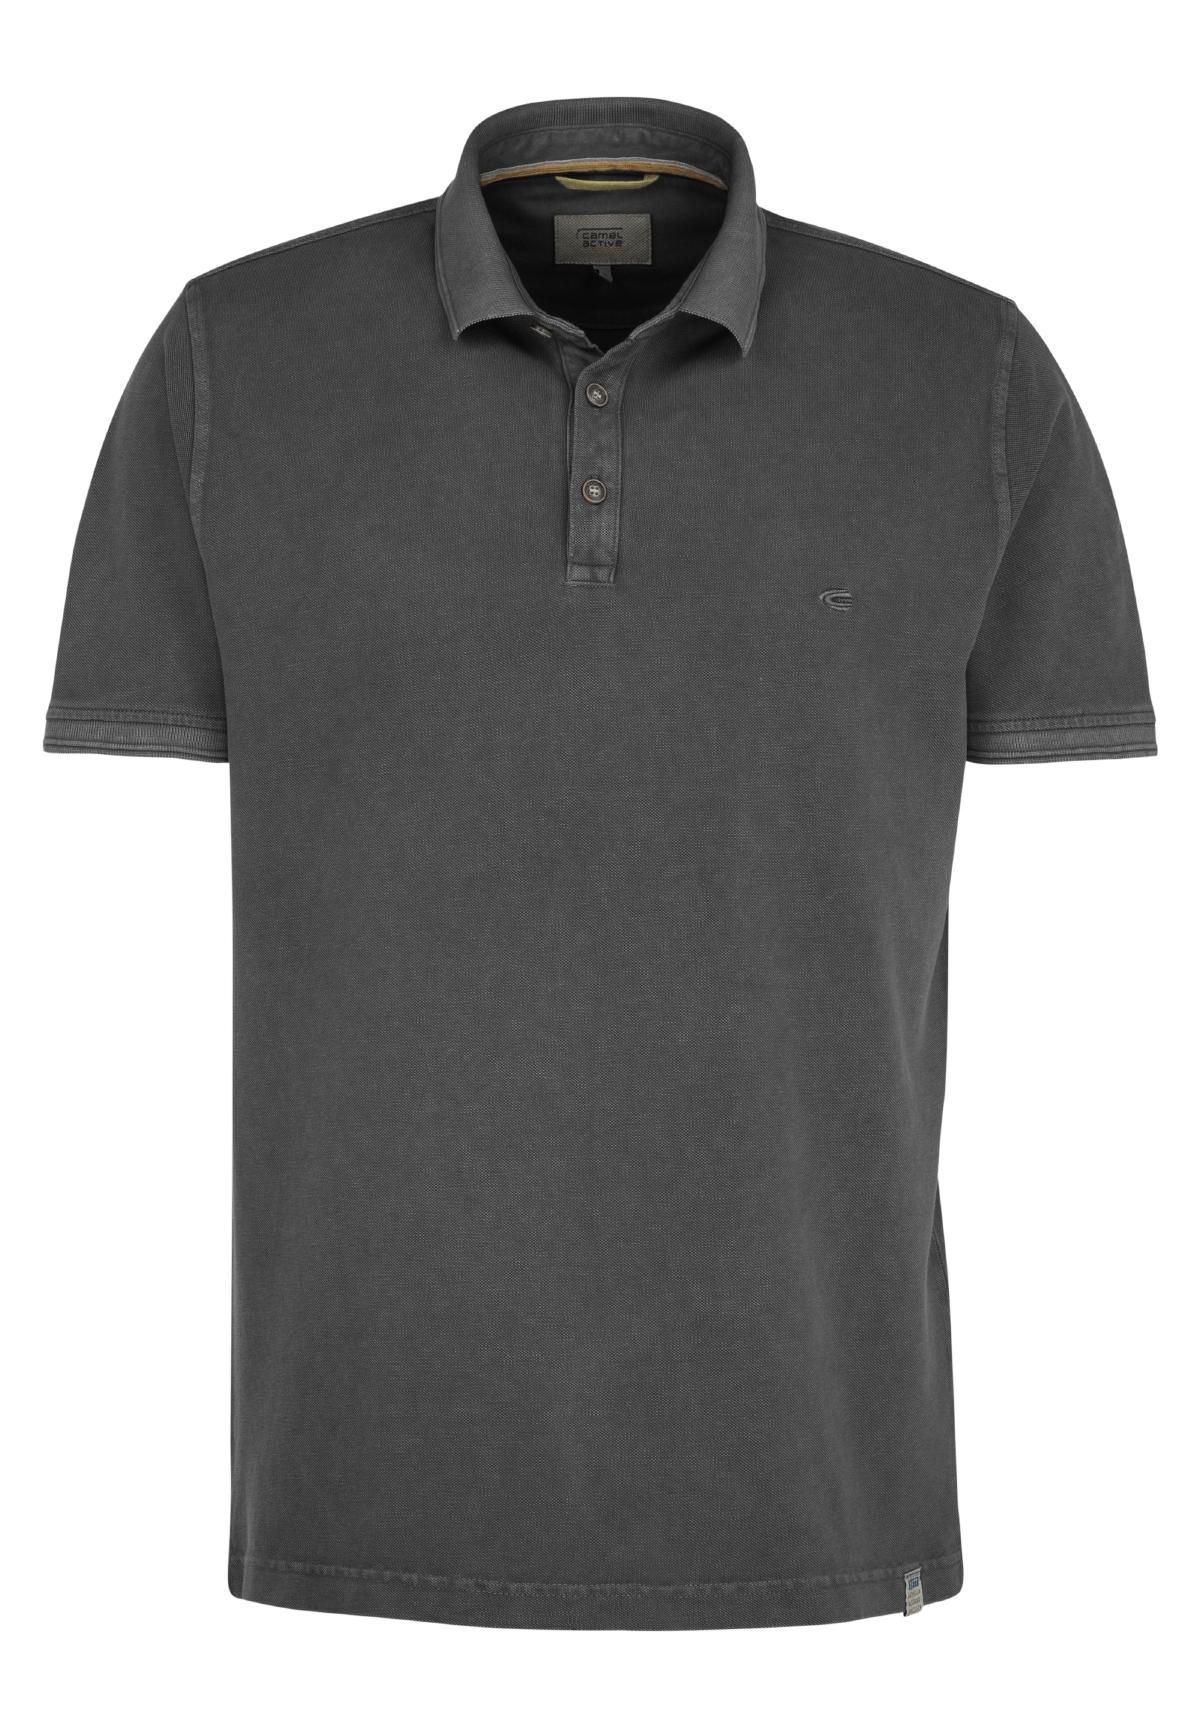 Camel-Active-Herren-Shirt-Poloshirt-Pique-Regular-Fit-NEU Indexbild 47